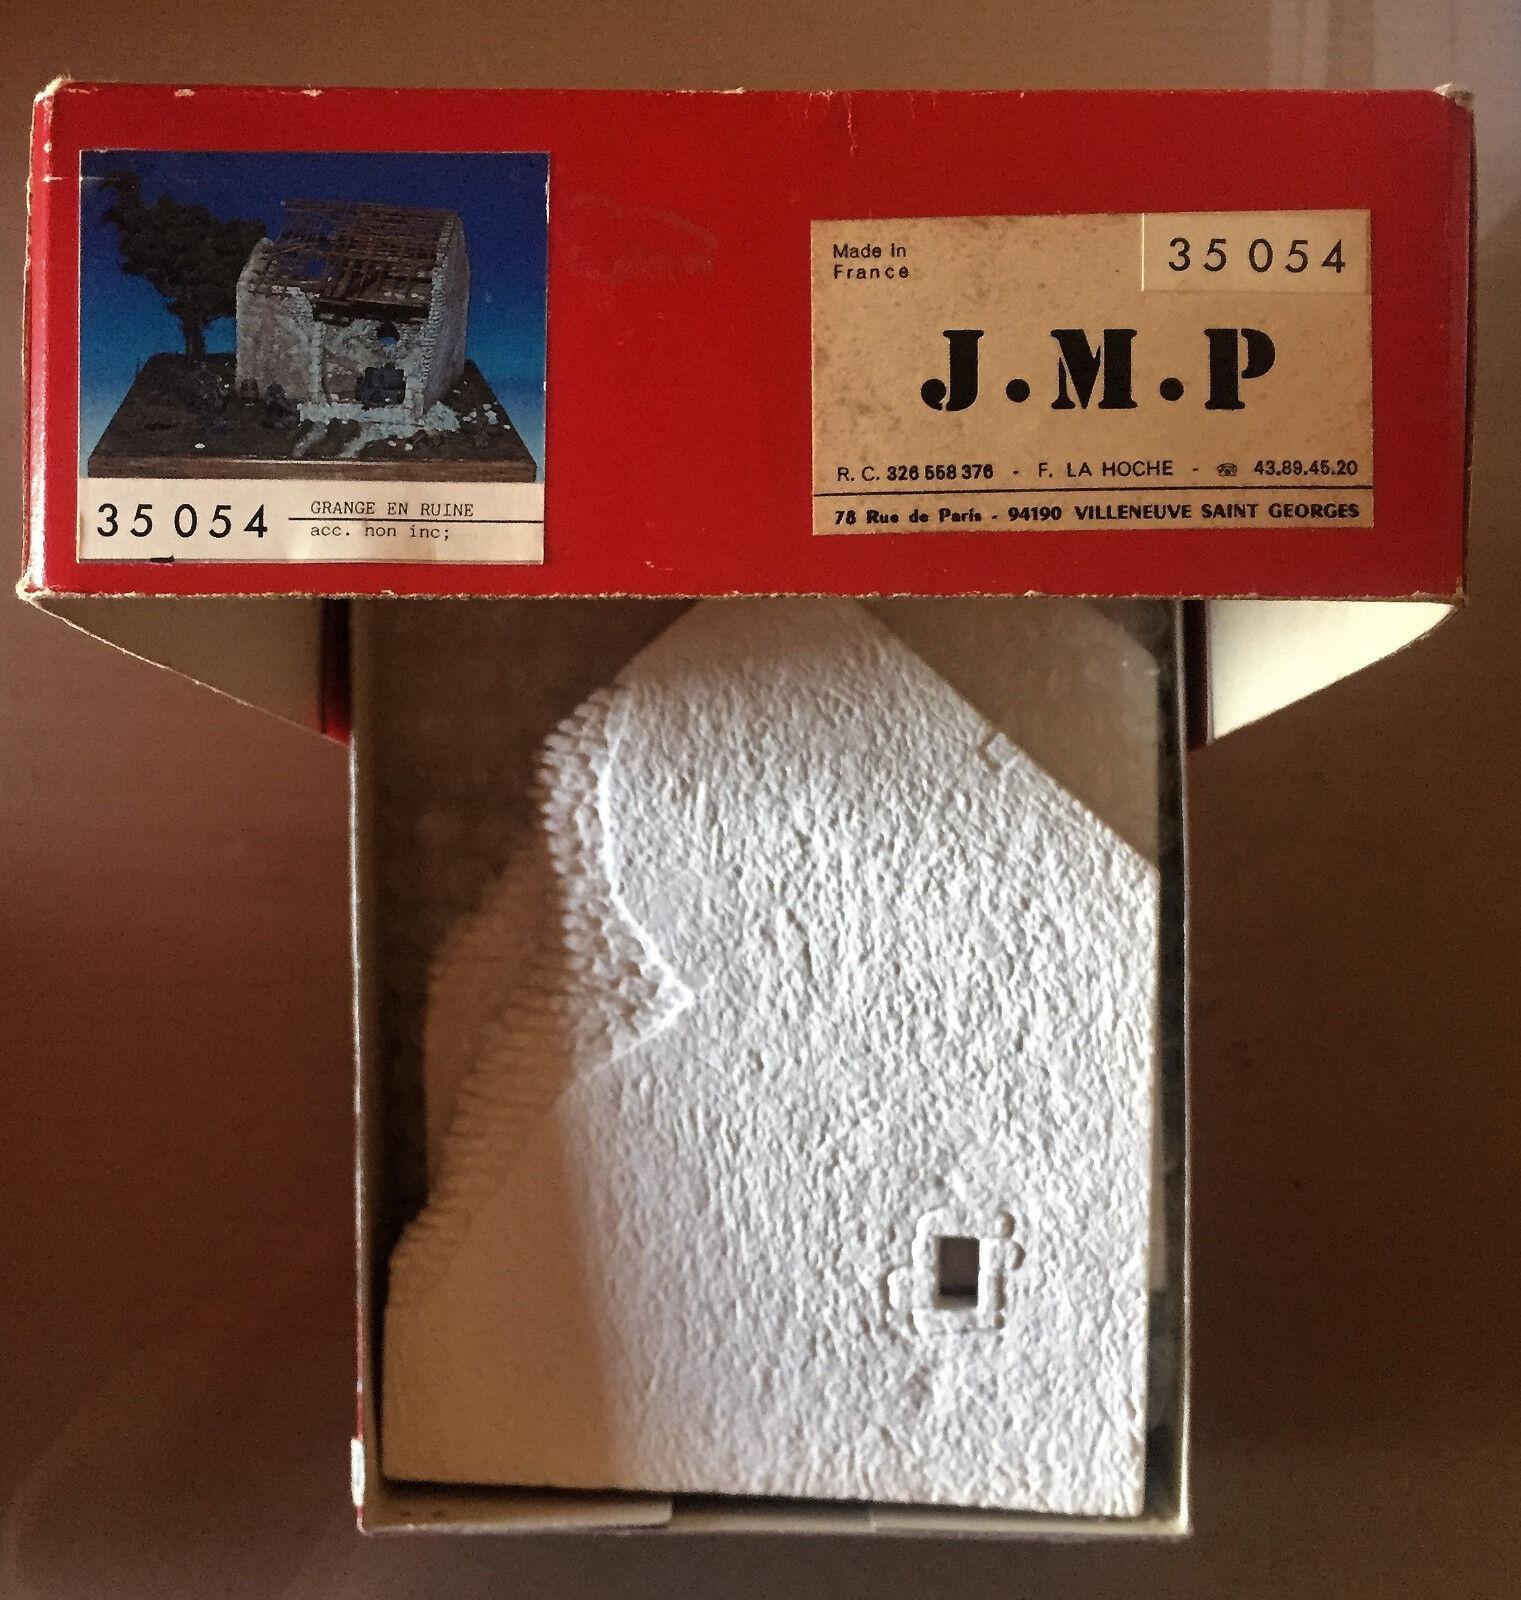 J.M.P PRODUCTION 35054 - GRANGE EN RUINE - 1 35 CERAMIC RESIN KIT RARO